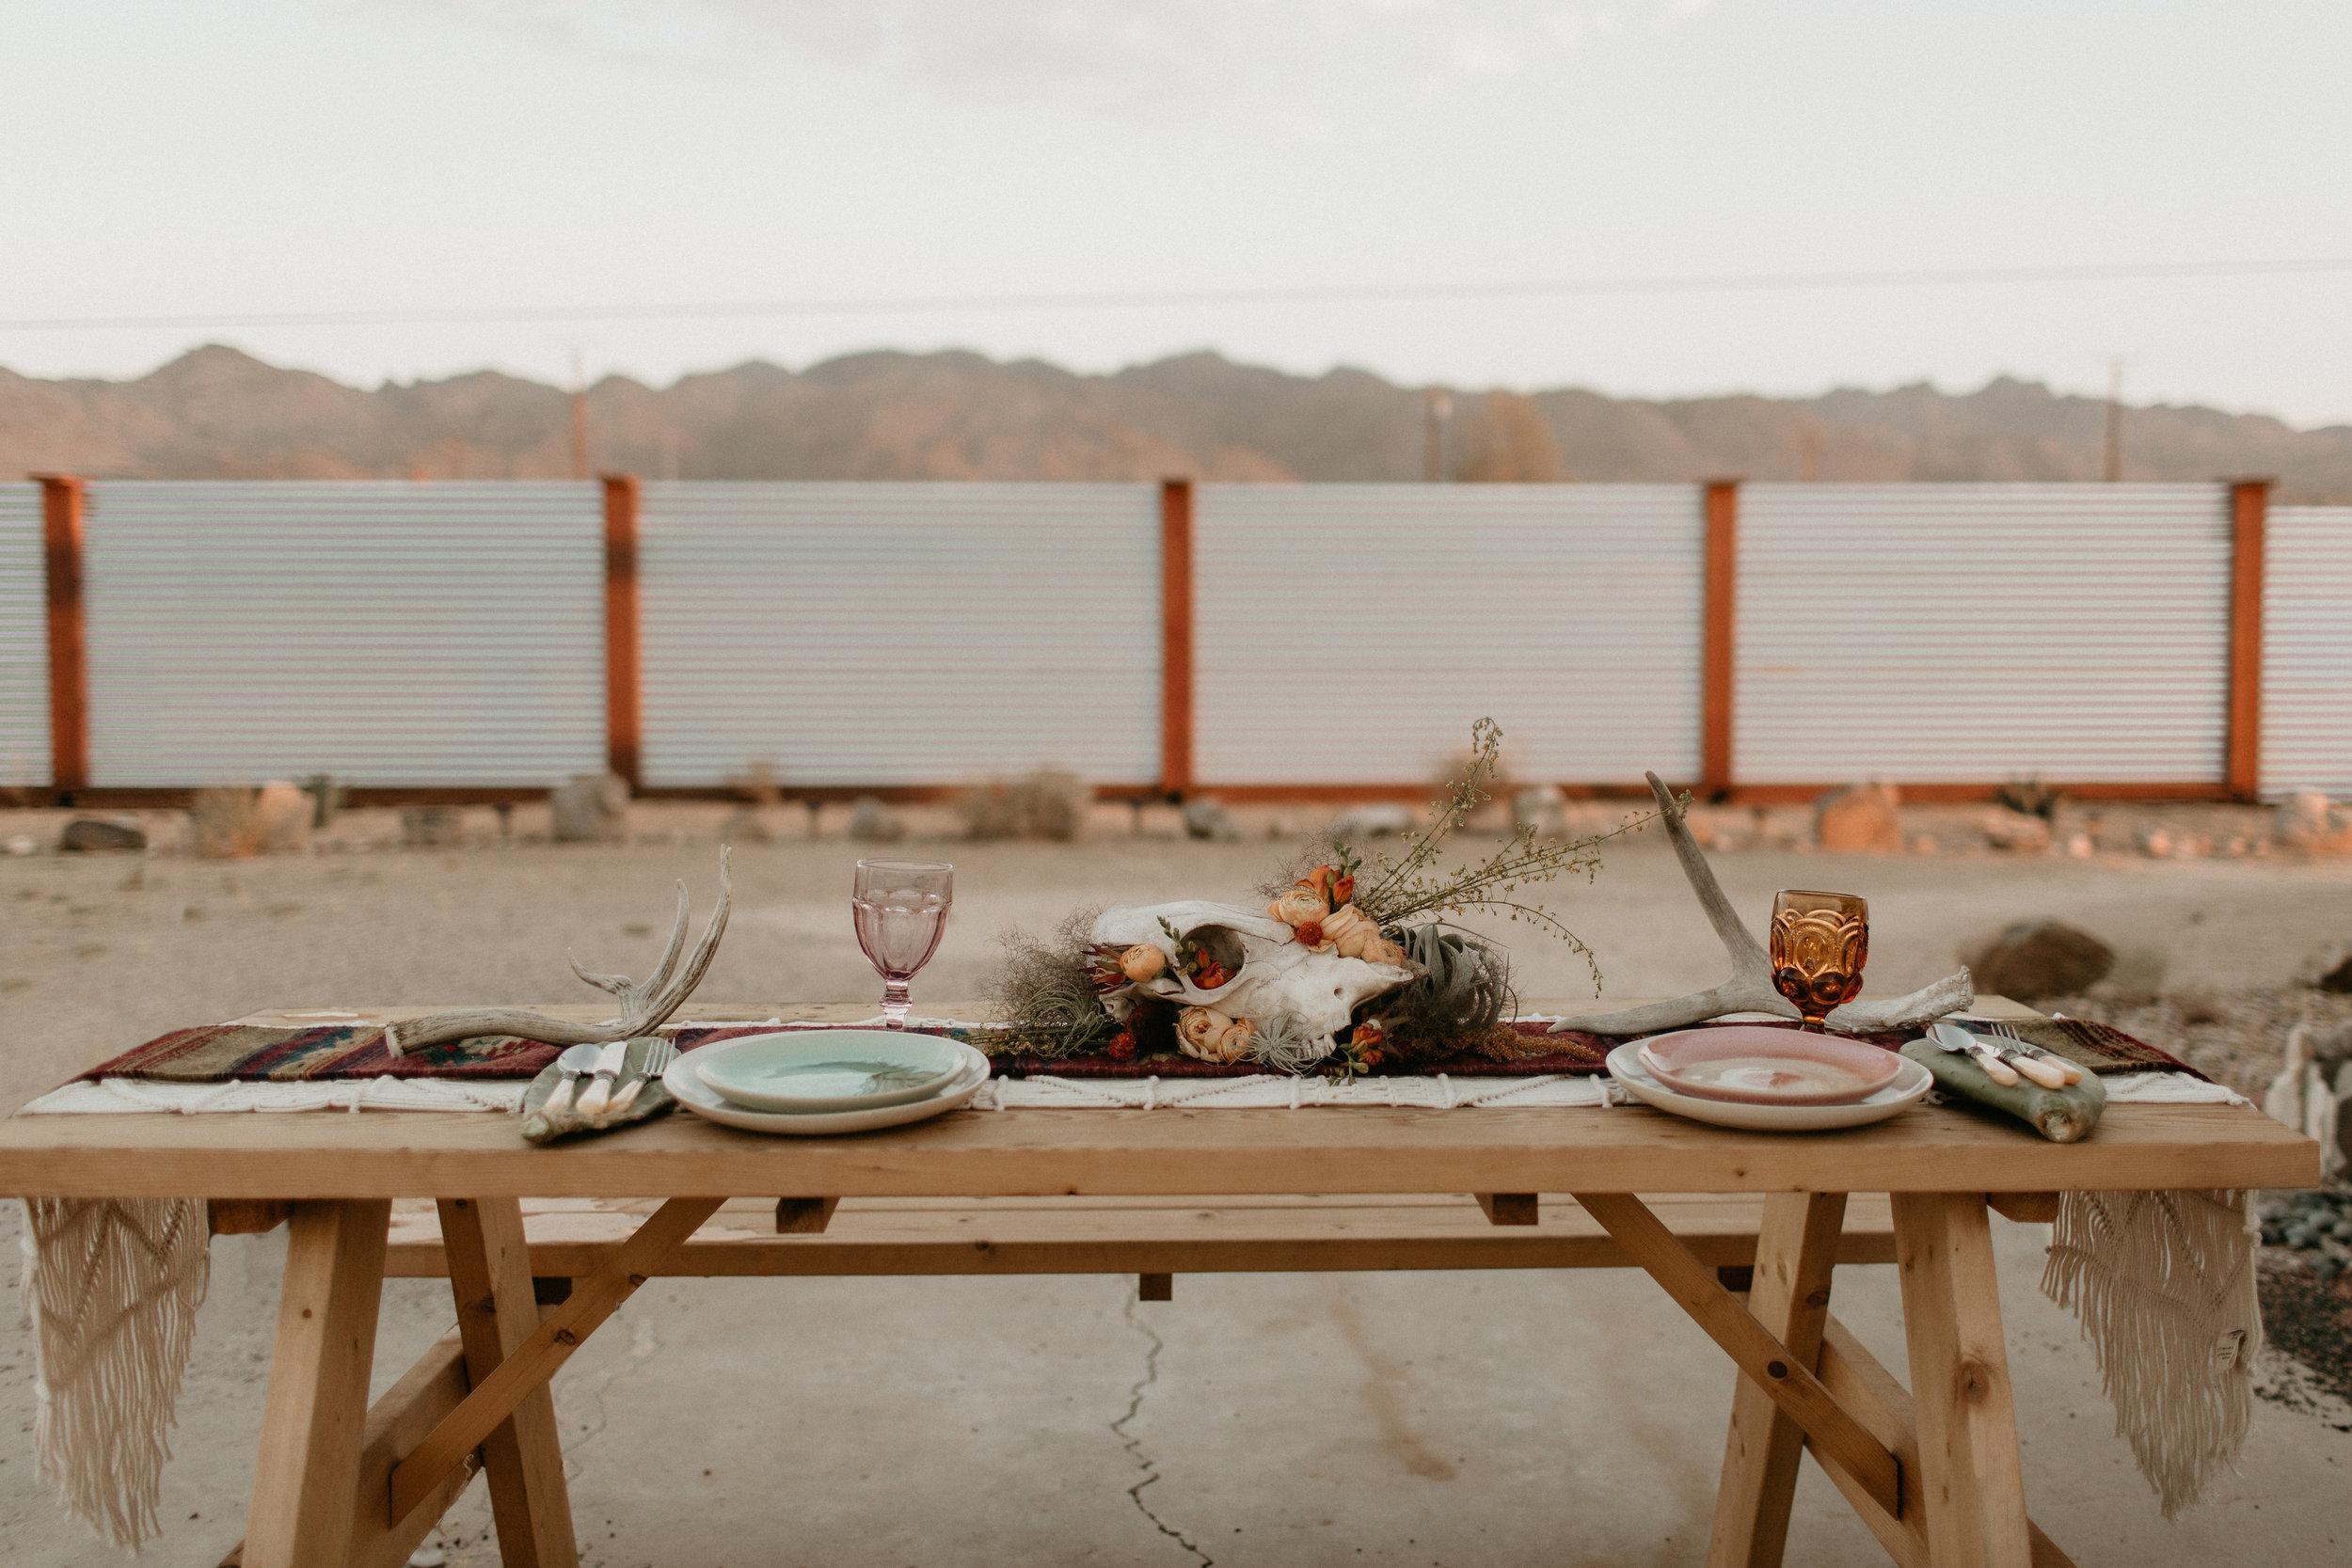 desert wedding ideas #lrqcfloral